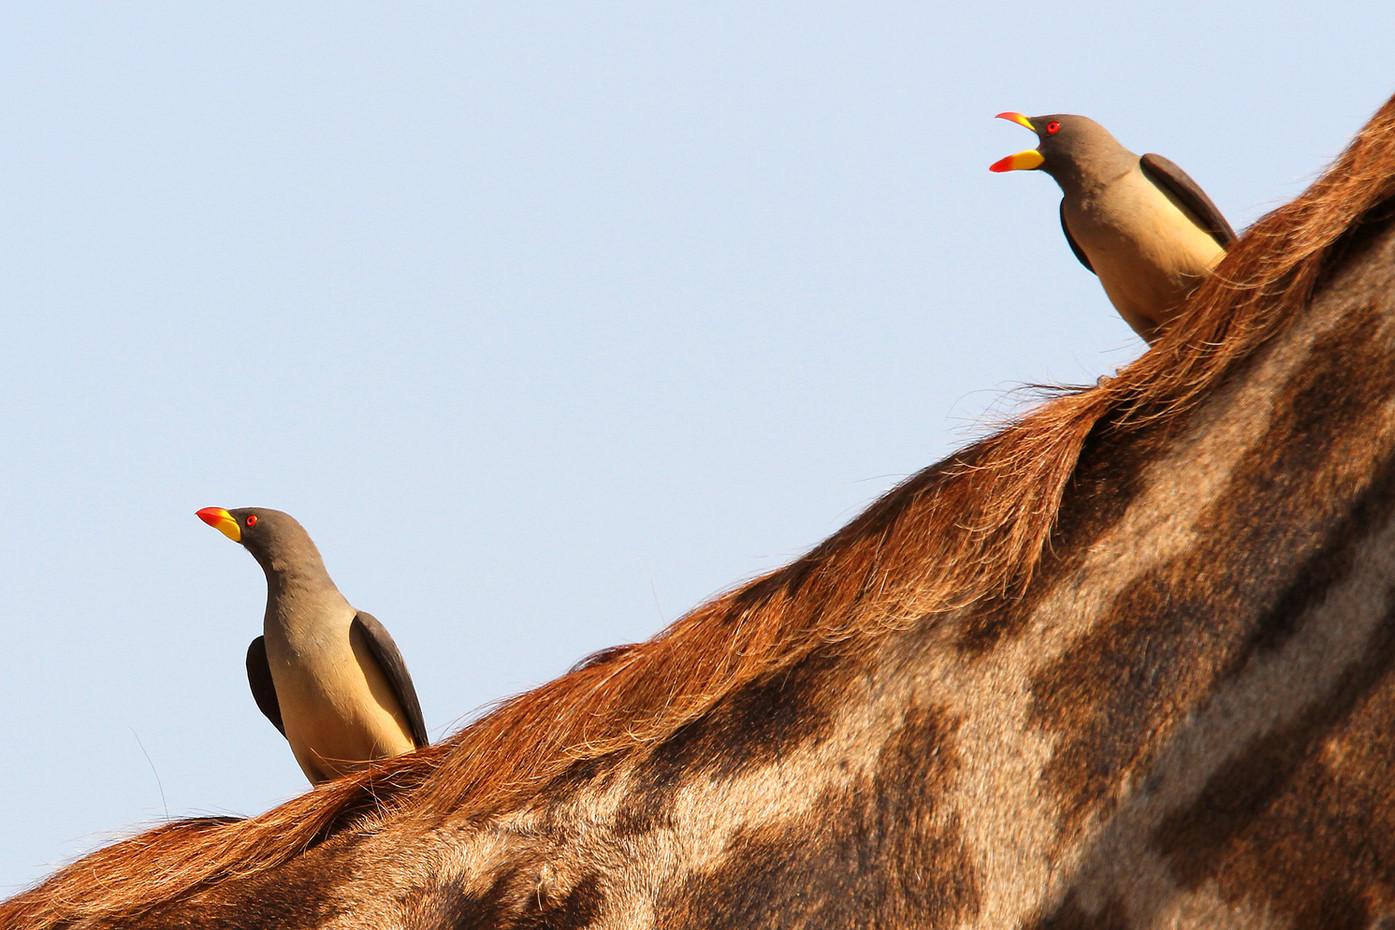 Yellow-billed Oxpeckers & giraffe in the Serengeti NP, Tanzania